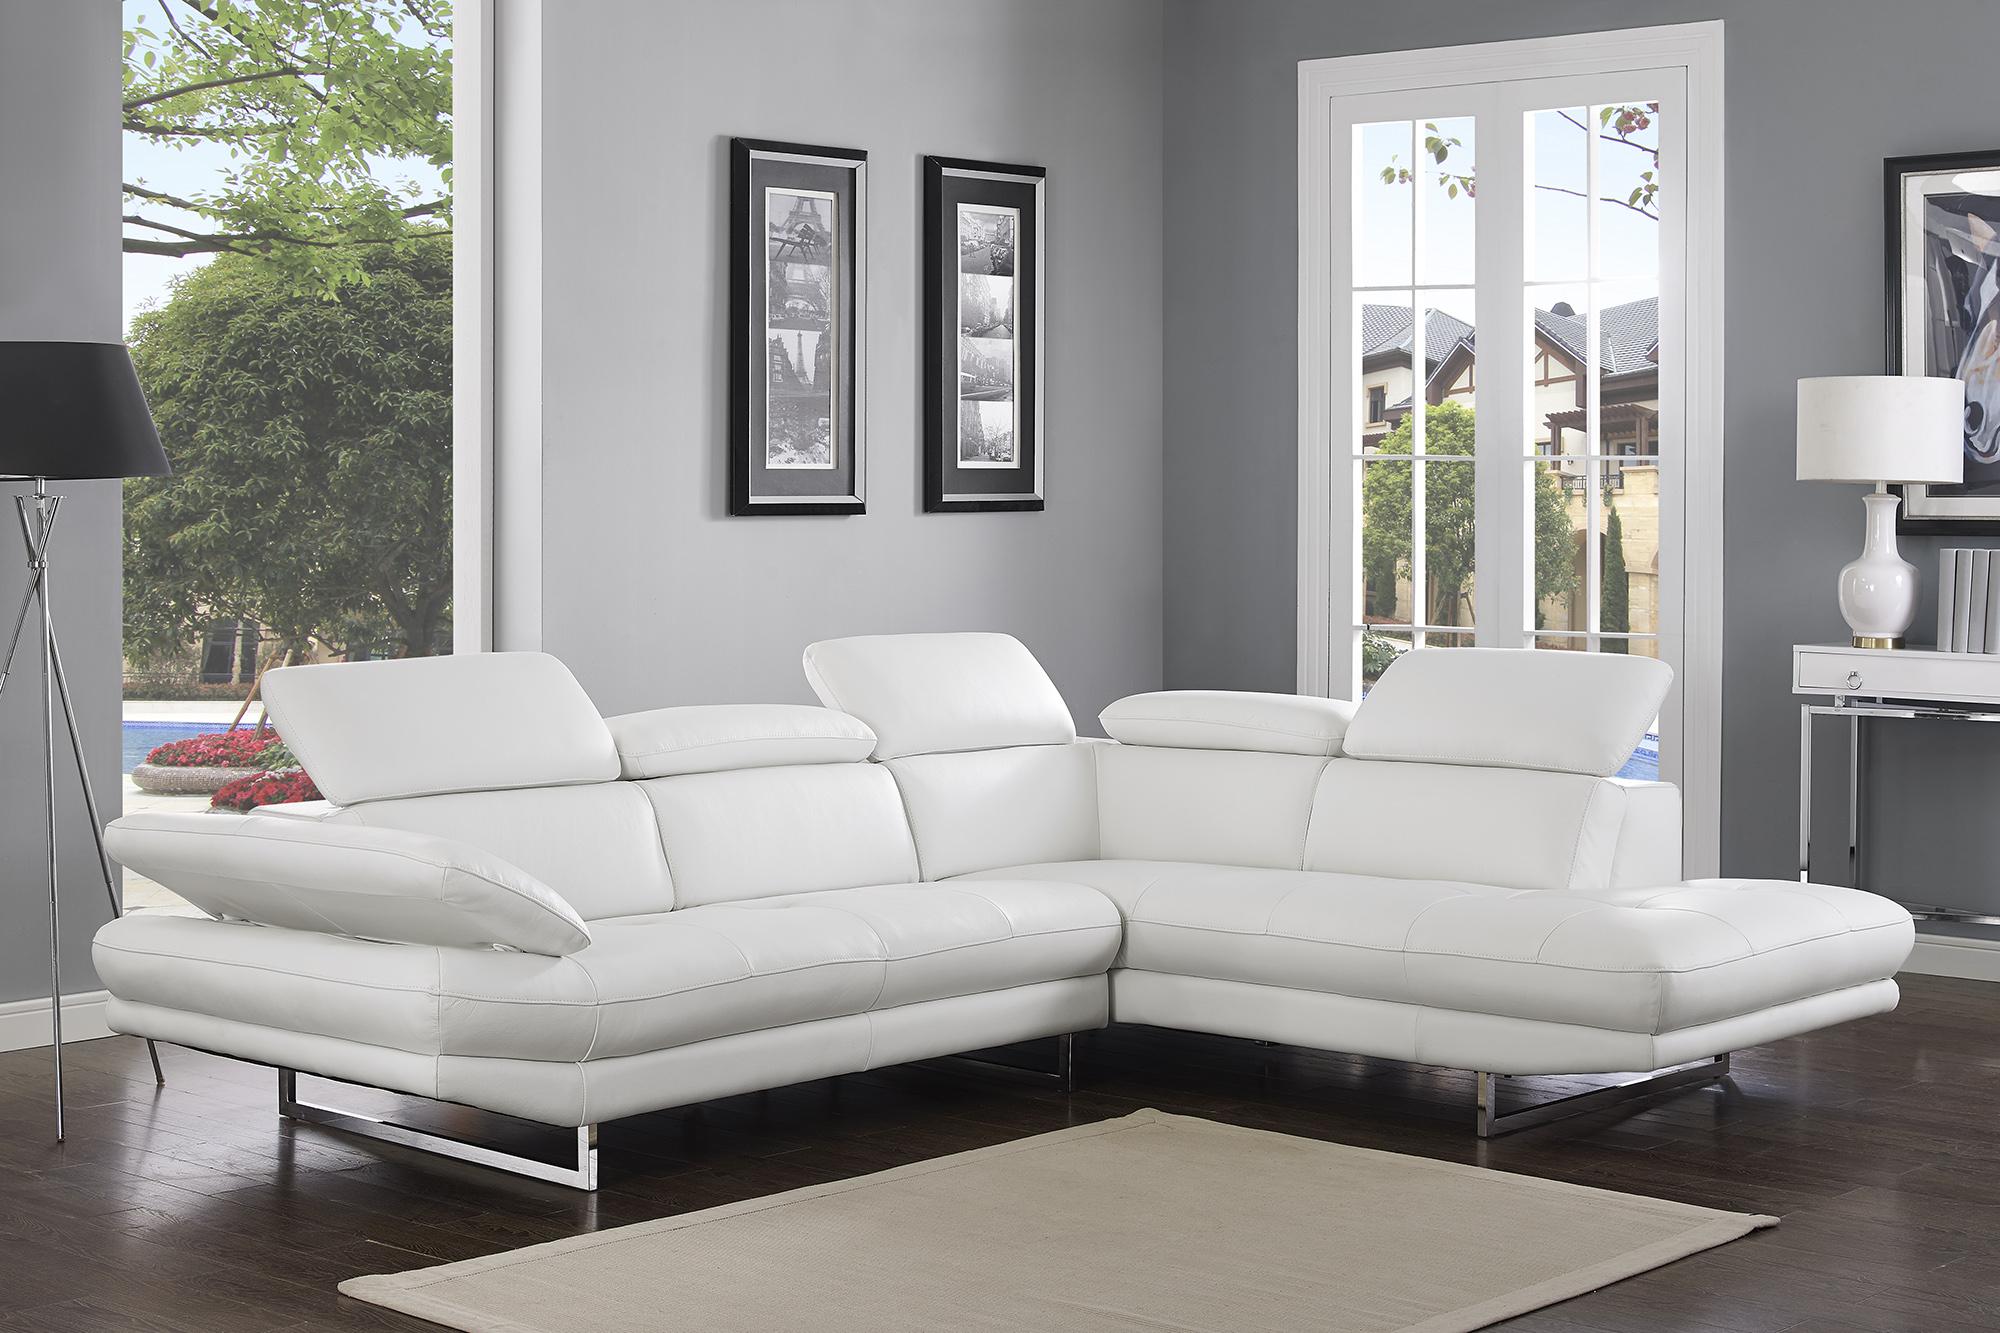 Adjustable Advanced Tufted Corner Sectional L-shape Sofa